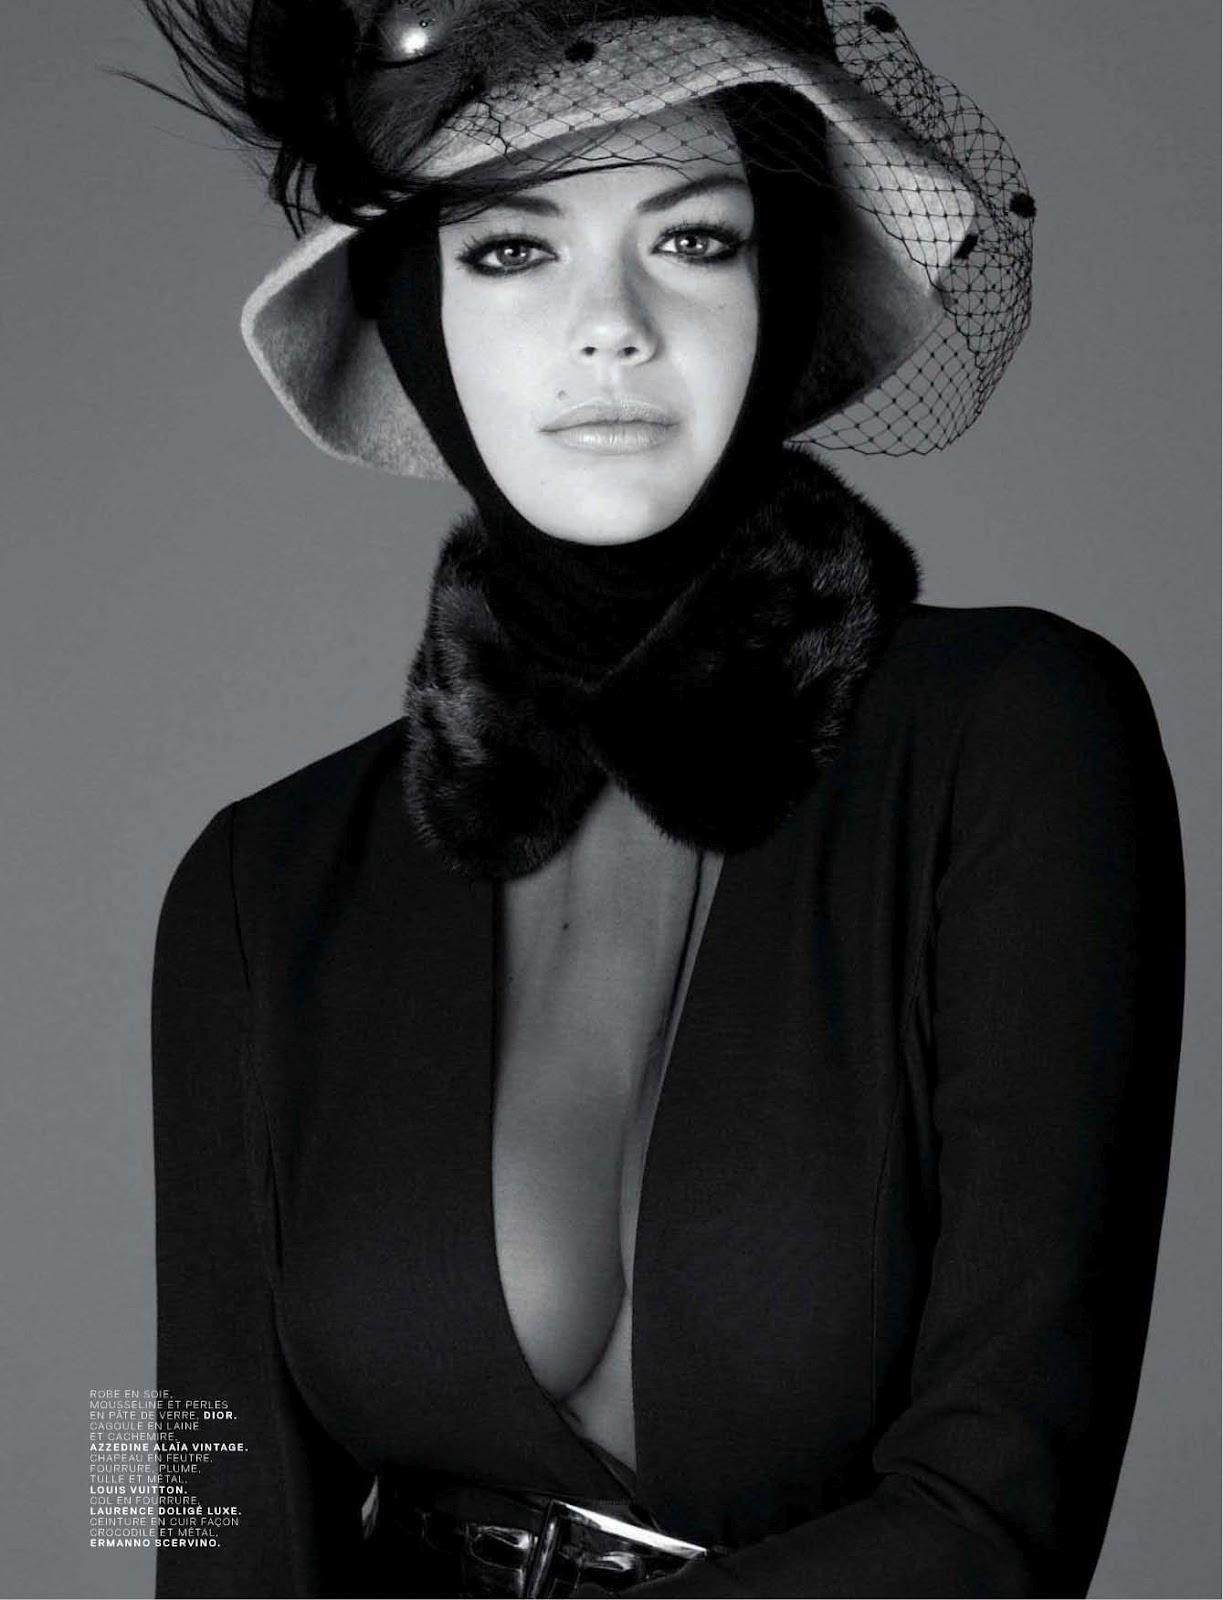 http://4.bp.blogspot.com/-wZnM6jYzFBk/UGSTz89LMwI/AAAAAAABA2M/fhzLpeKHSmQ/s1600/Kate+Upton+Hot+Jalouse+(2).jpg